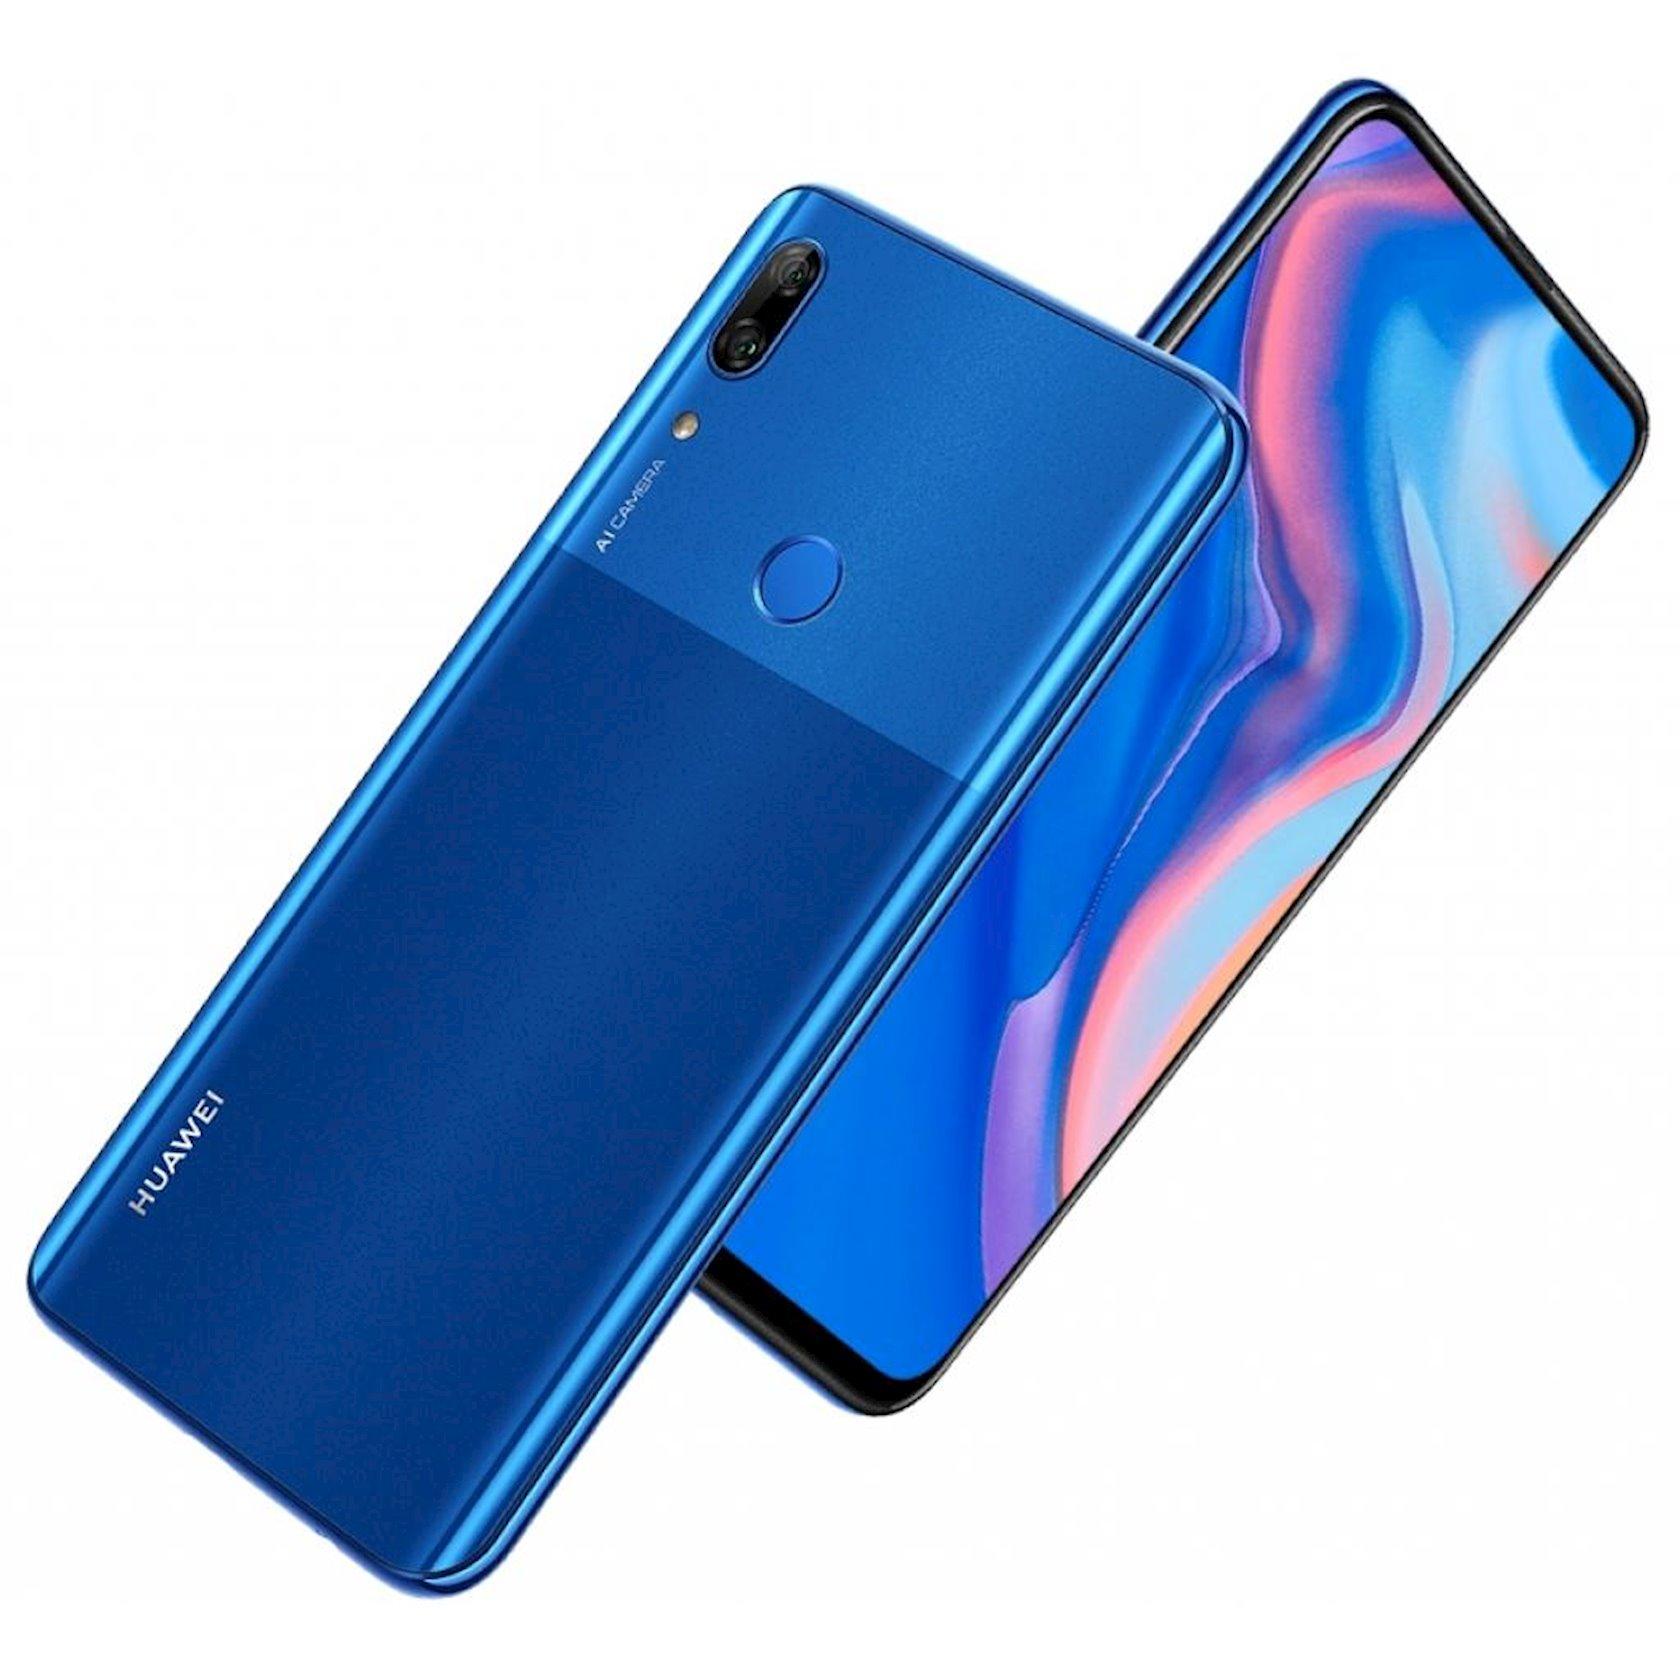 Smartfon Huawei P Smart Z 4GB/64GB Blue